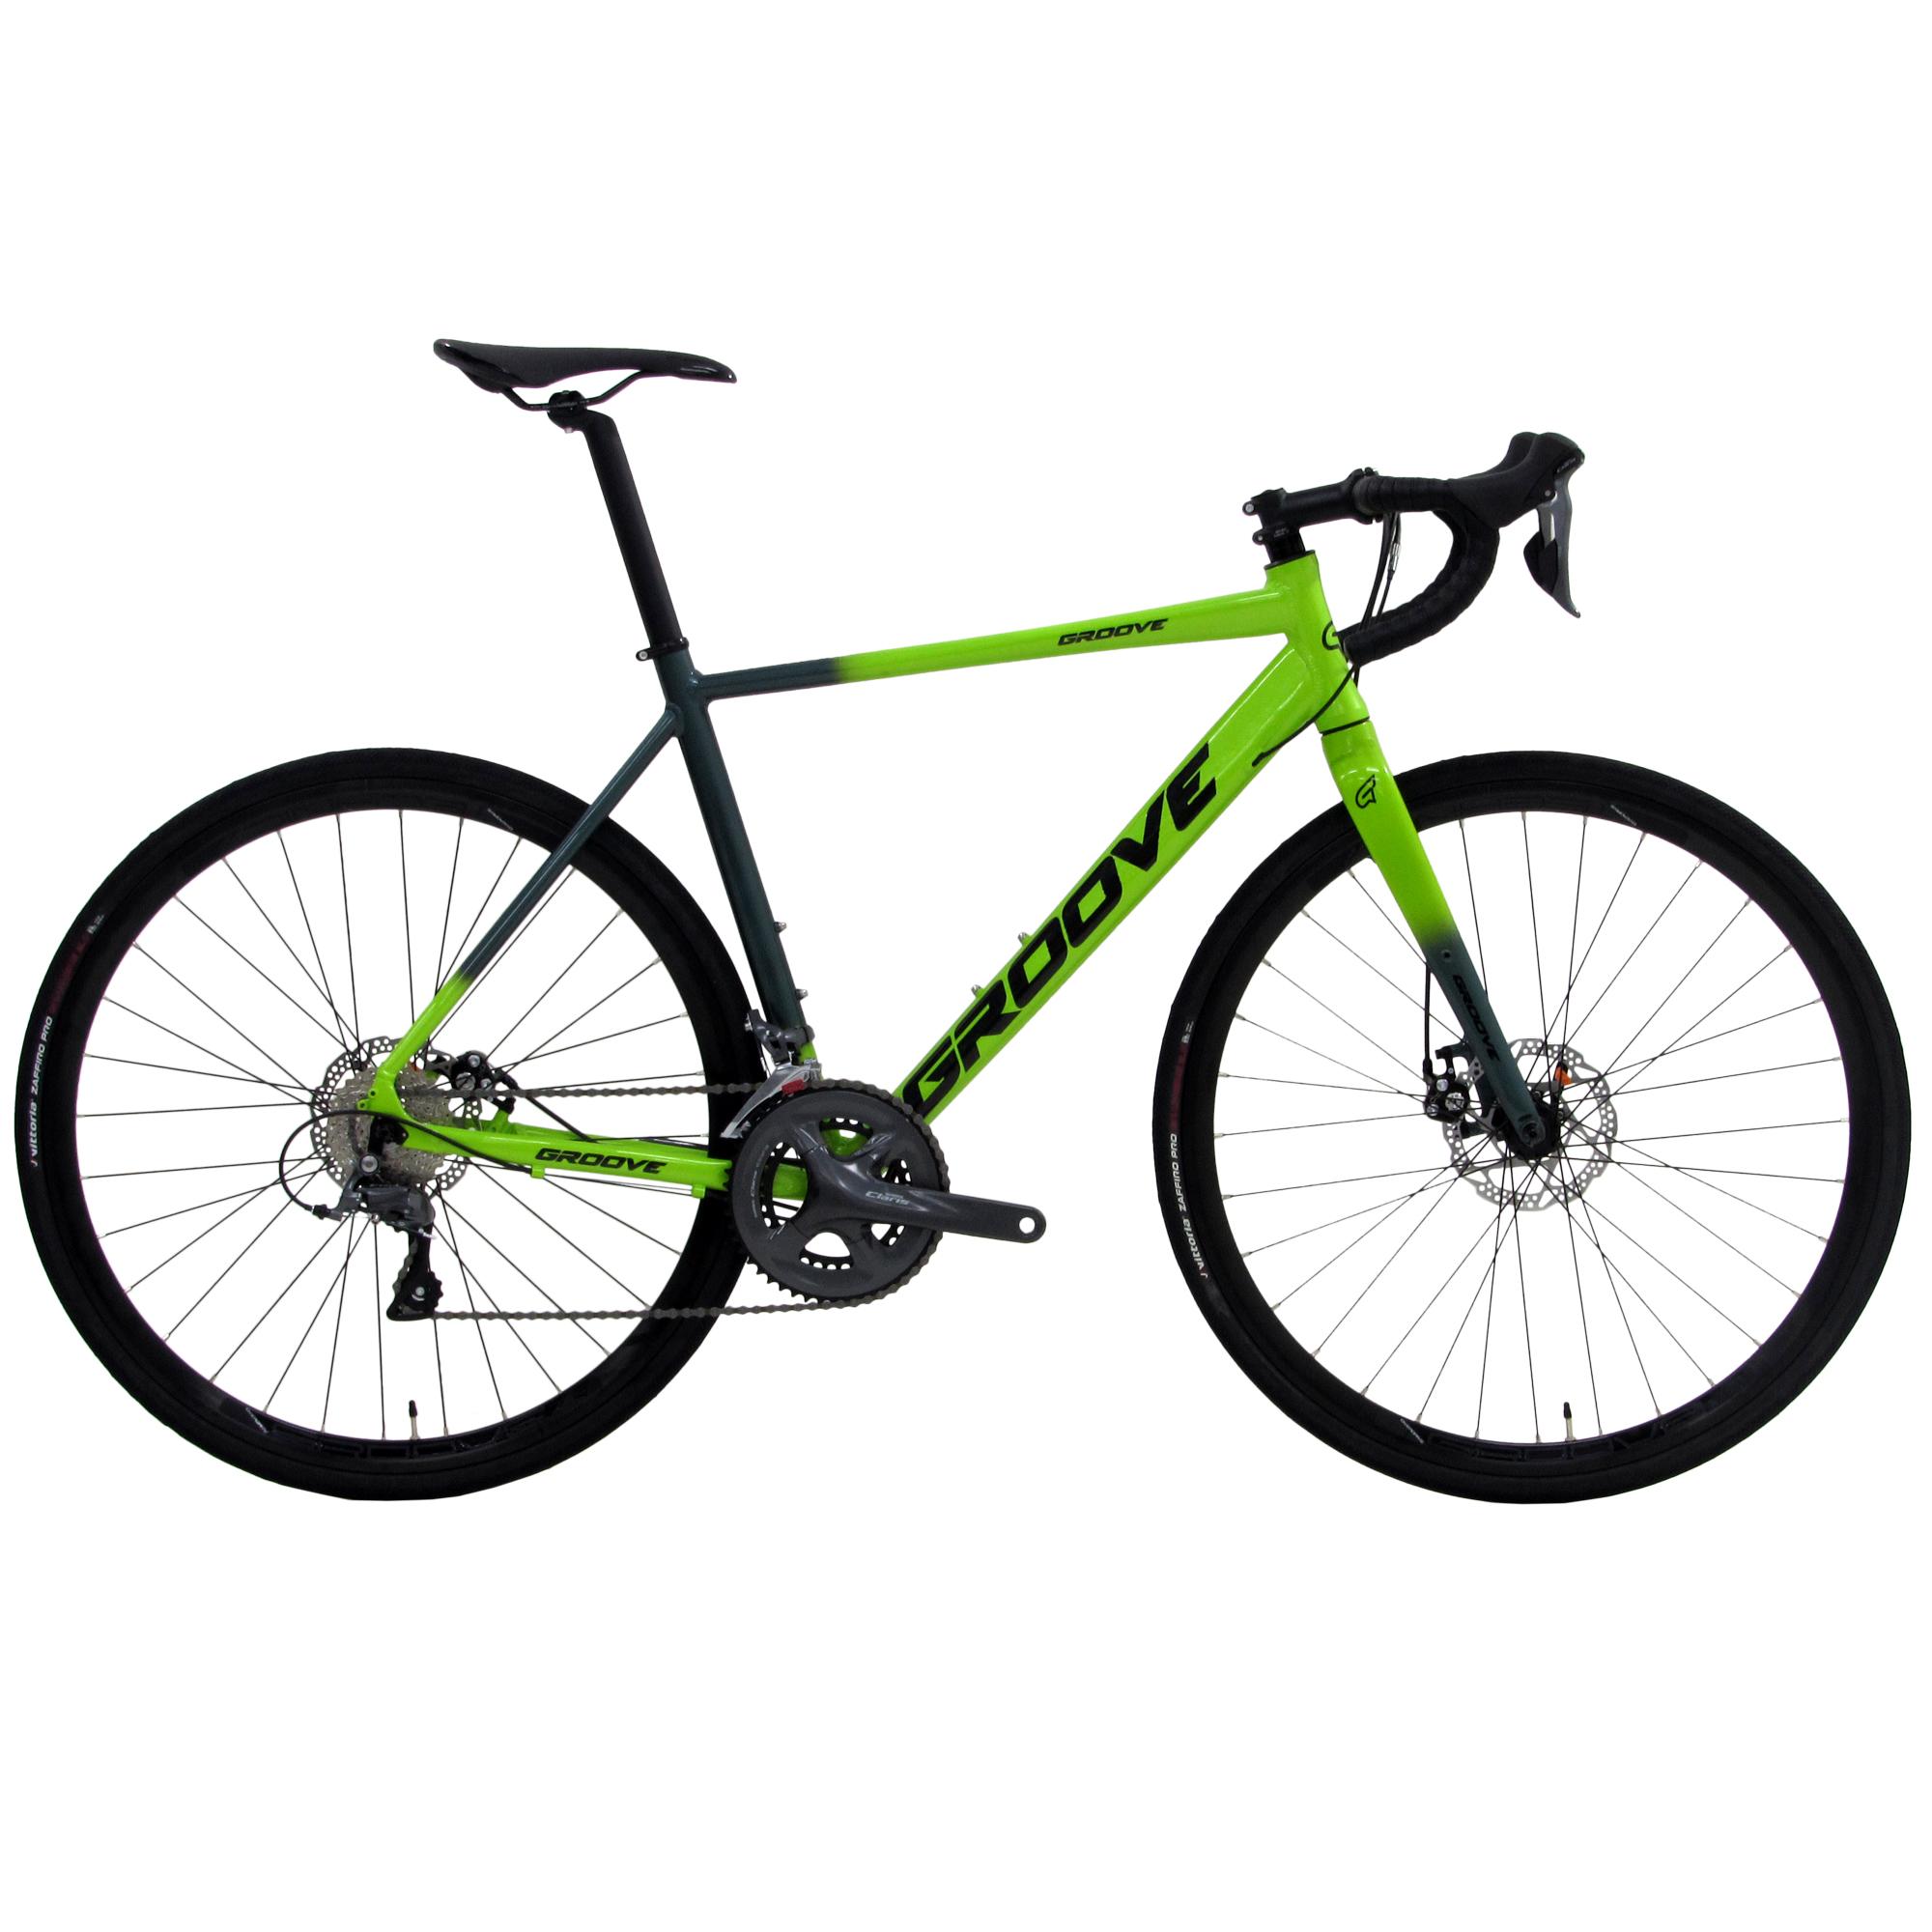 Bicicleta-Groove-Overdrive-50